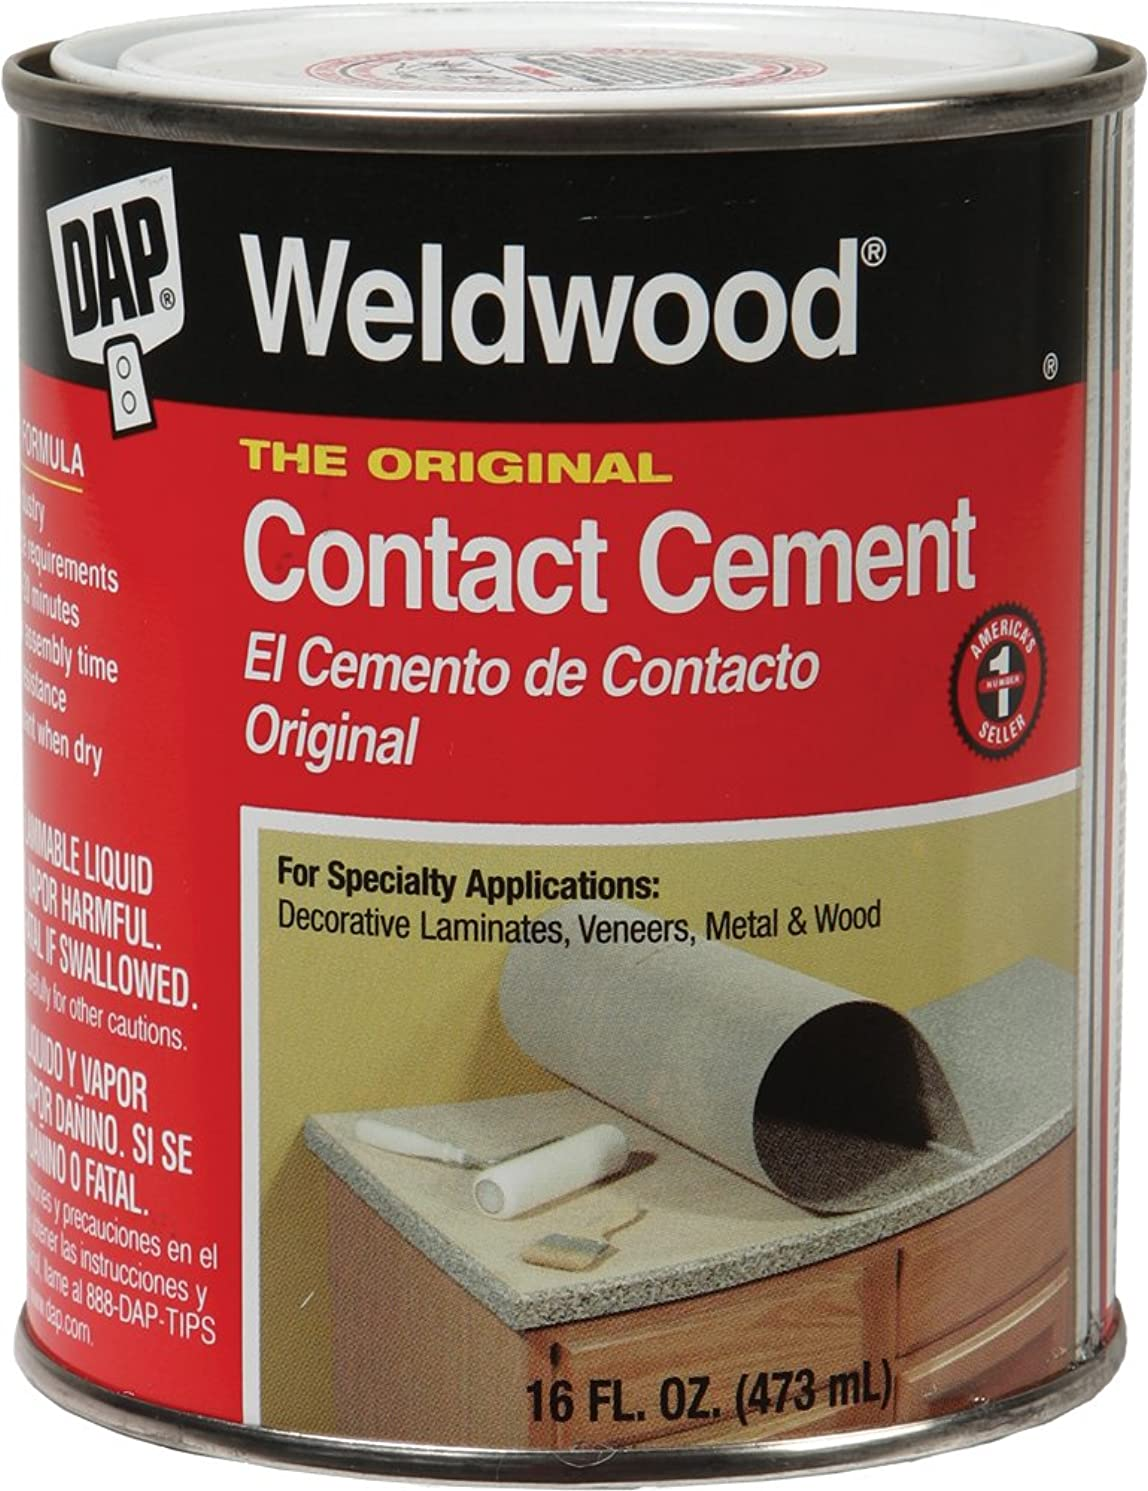 Hydro-Turf Cc20 Hydro Turf Contact Cement 16 Oz. Dap Weldwood